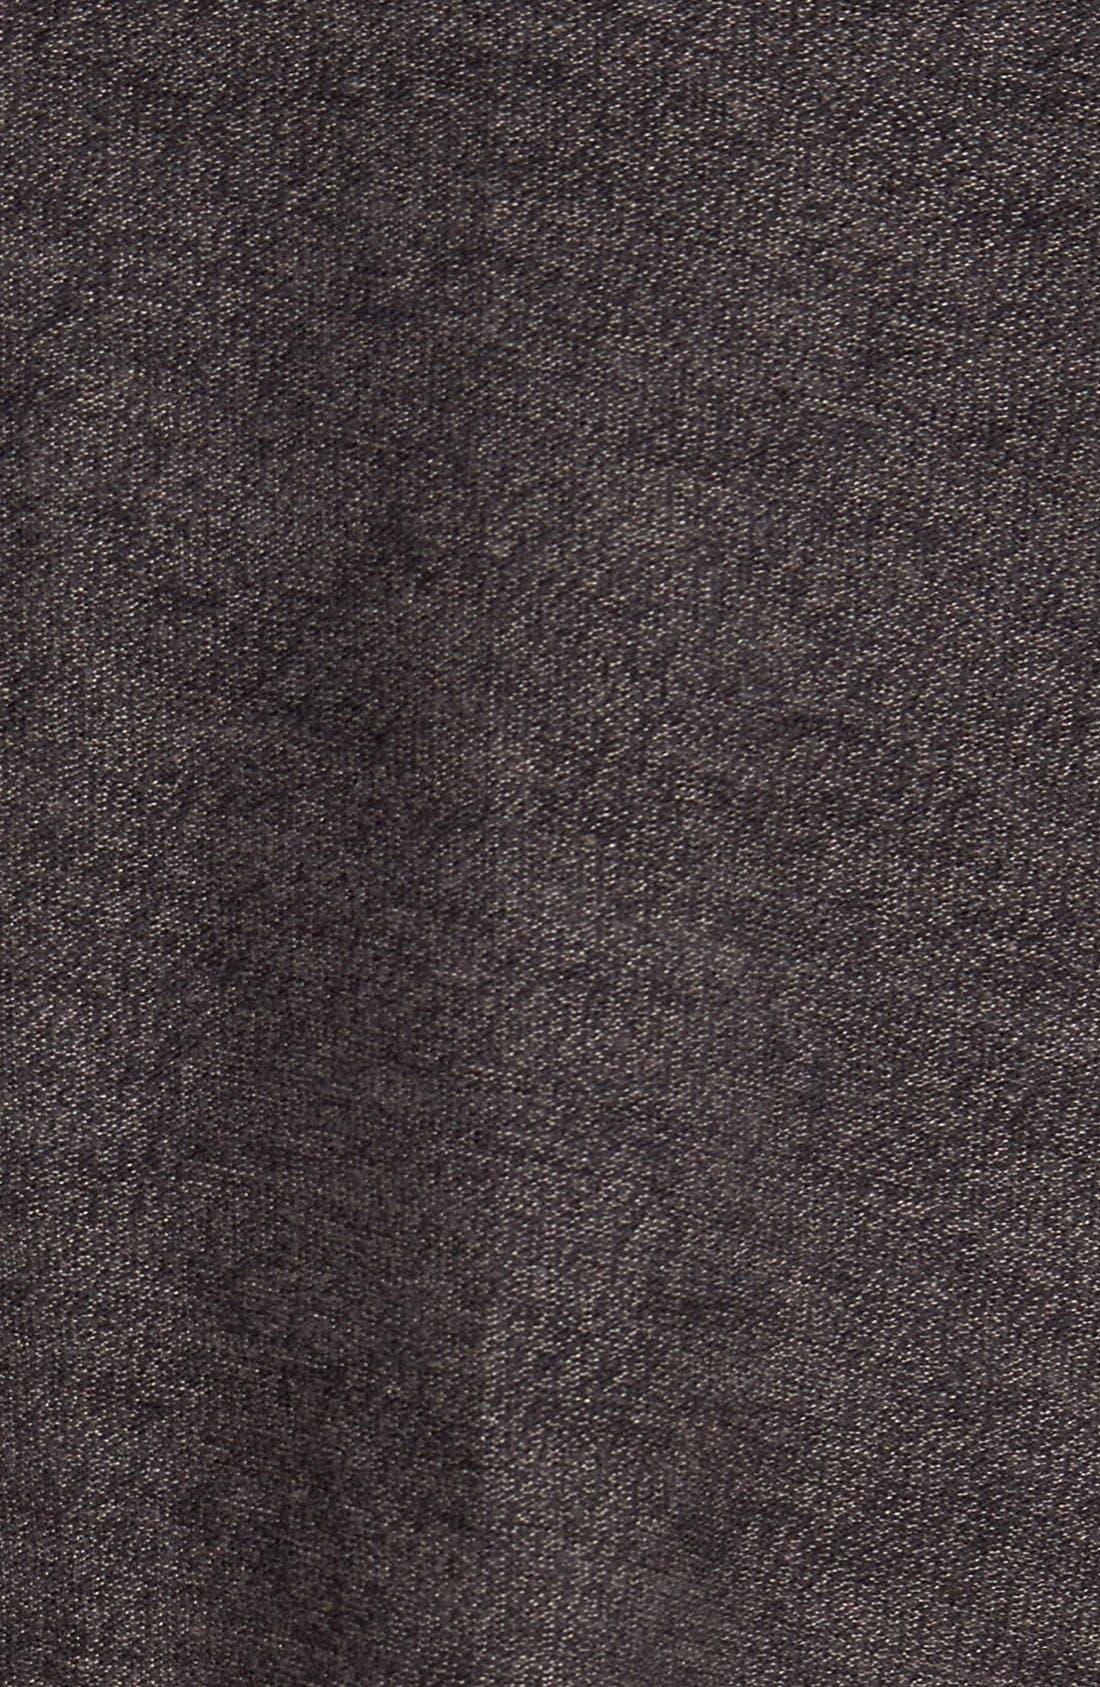 Turtleneck Sweater,                             Alternate thumbnail 5, color,                             034